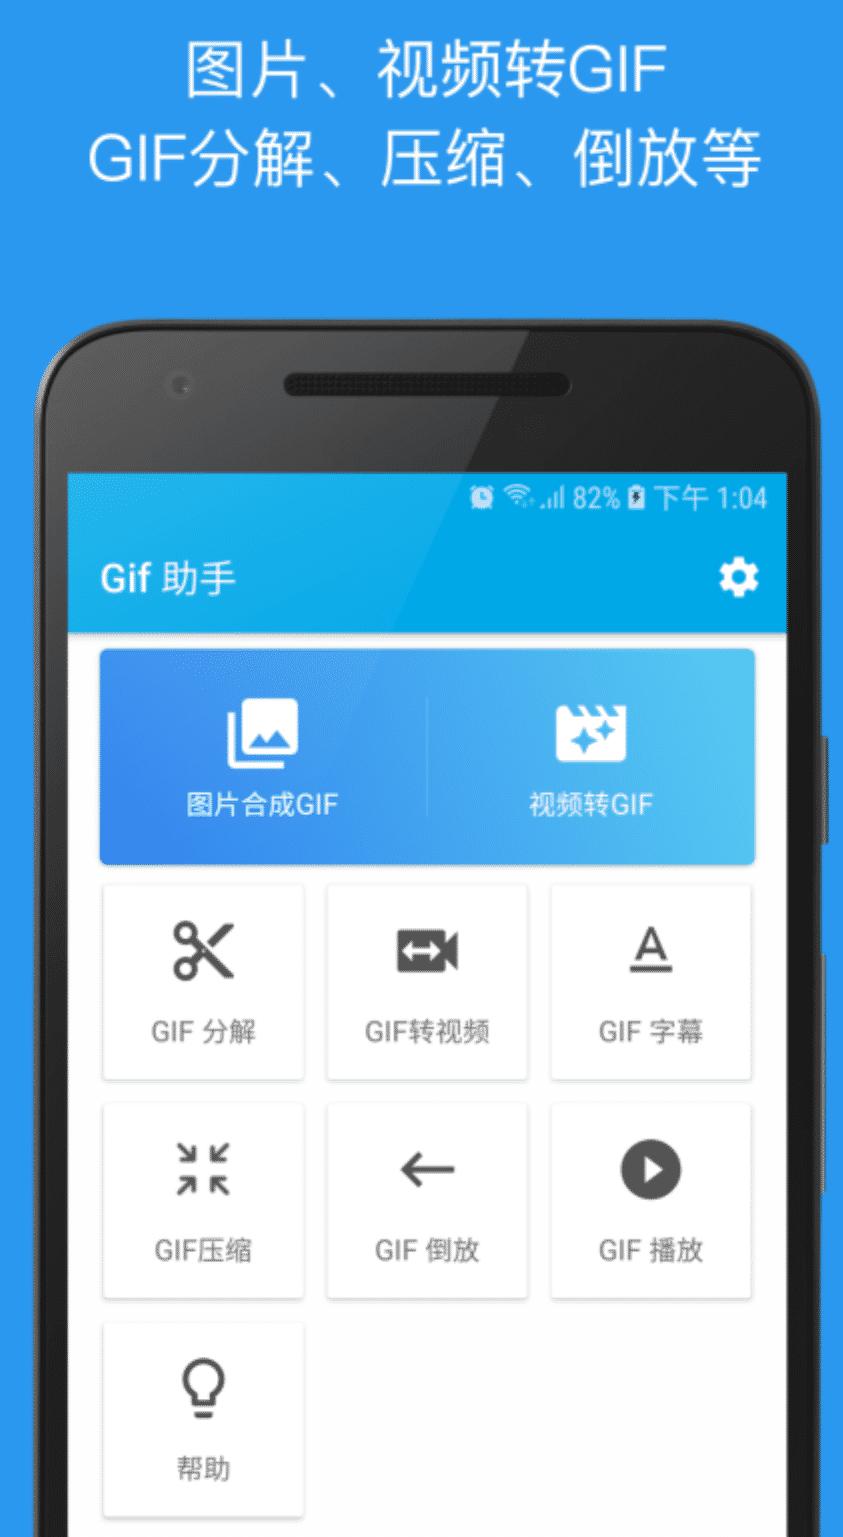 GIF助手v2.2.6去广告_去推荐_完美破解